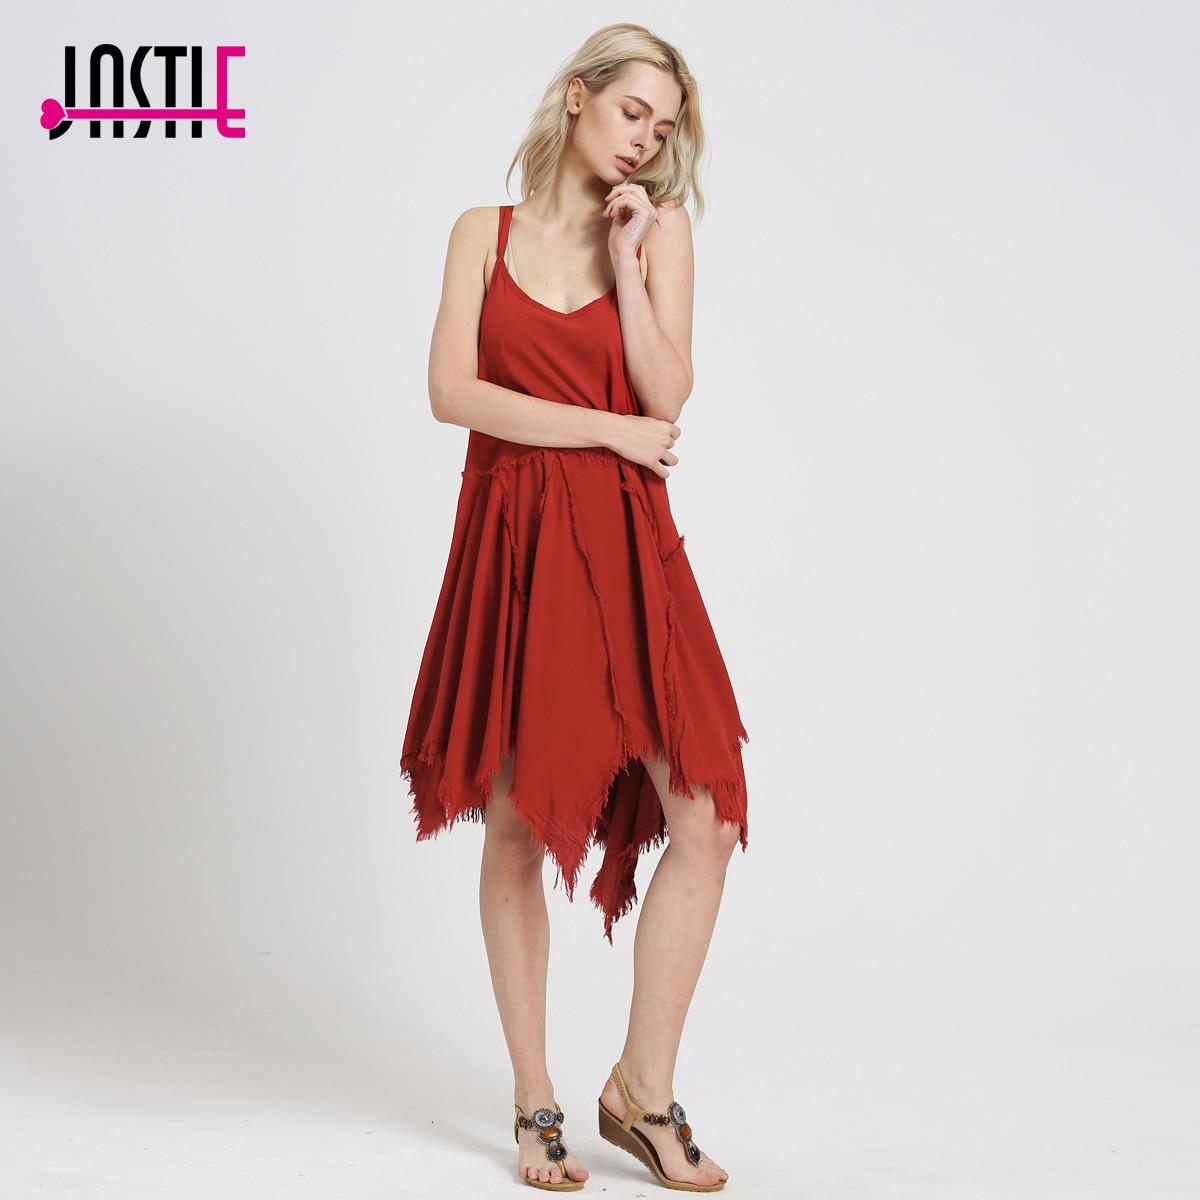 Jastie Double Straps Super Soft Racerback Slip Dress Women Dress Frayed Design Hemline Tattered Up Shred Slip Under Dresses 8083